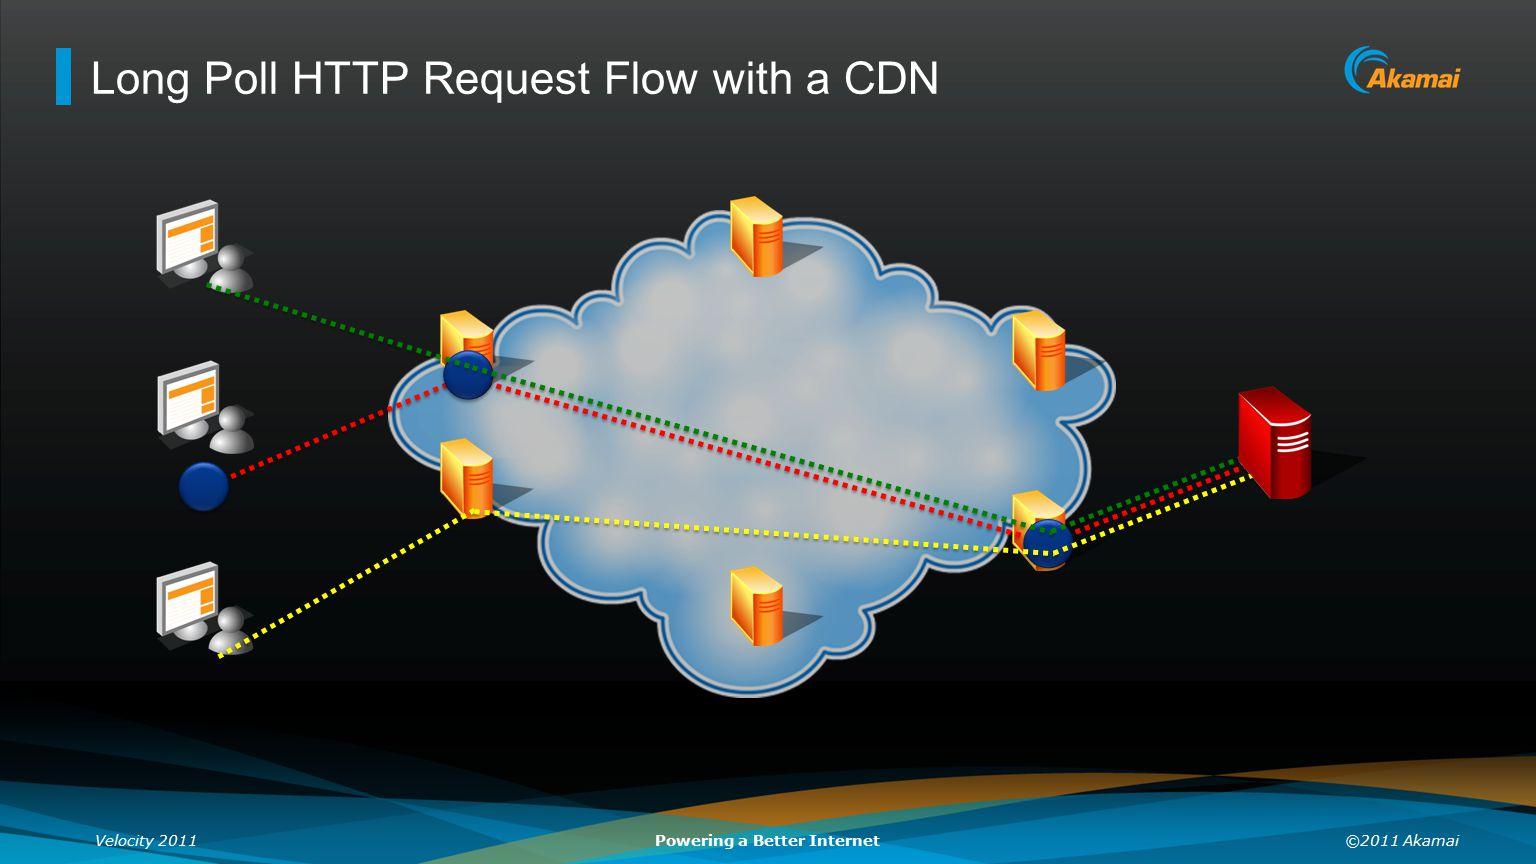 Long Poll HTTP Request Flow with a CDN